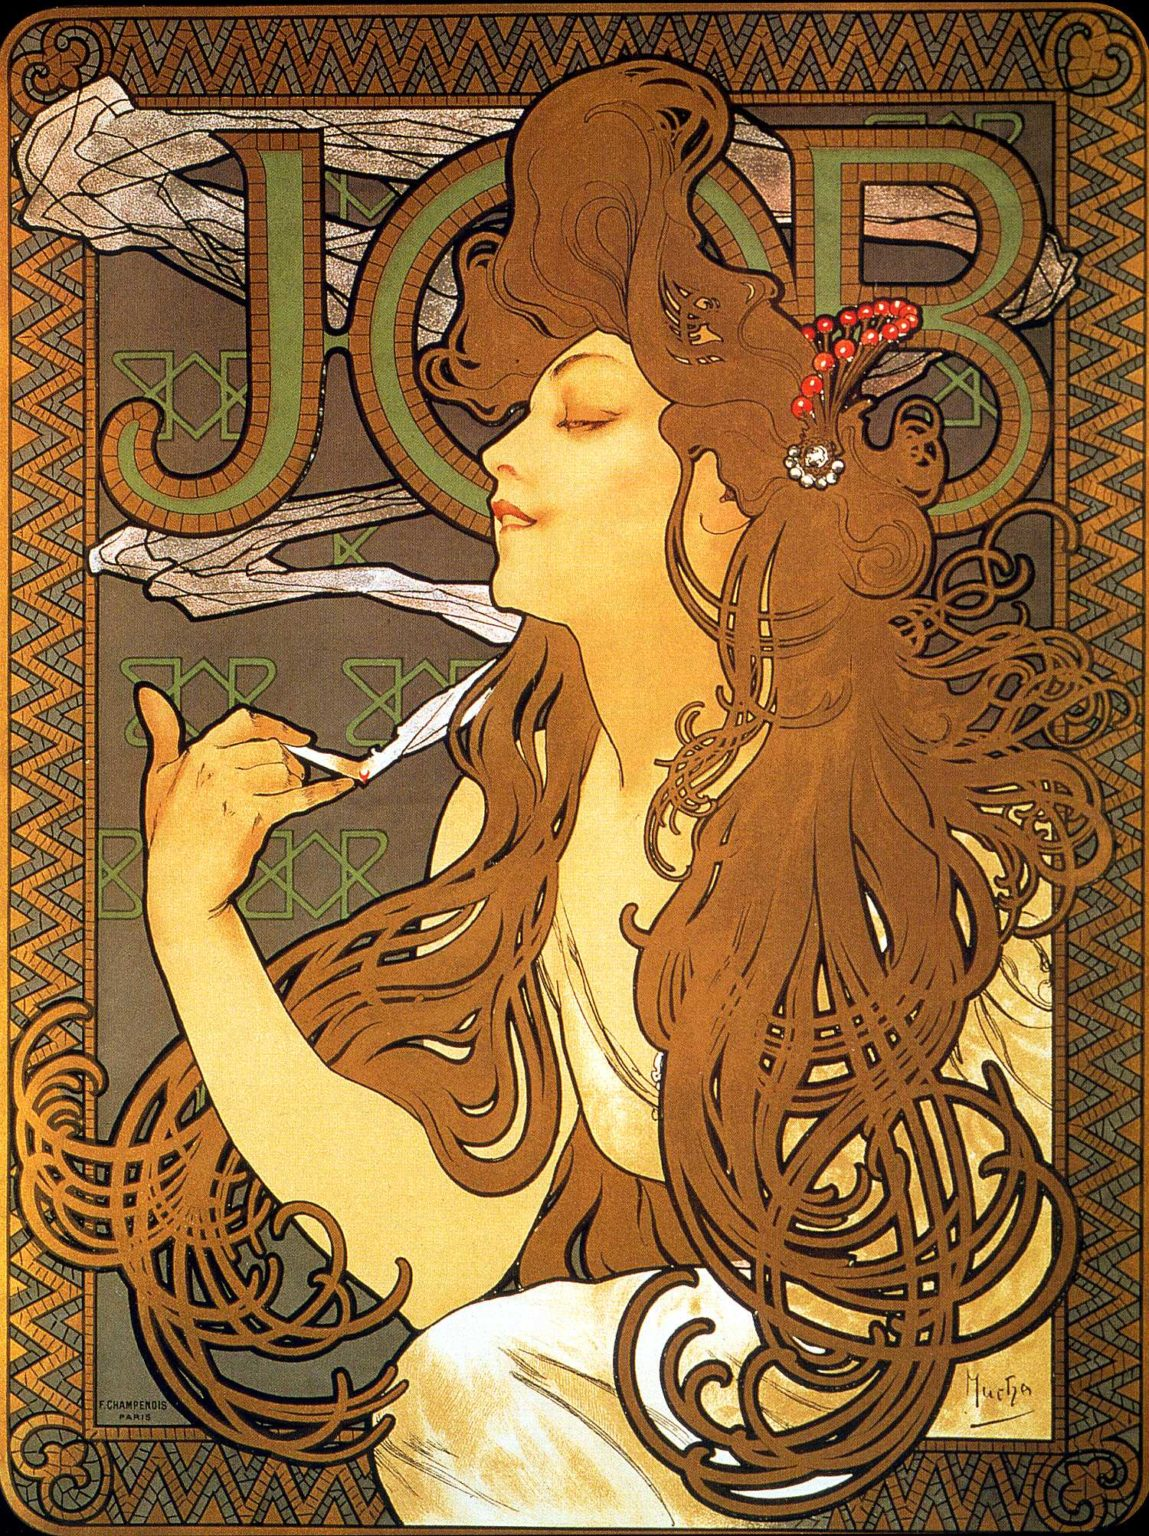 JOB (1896)